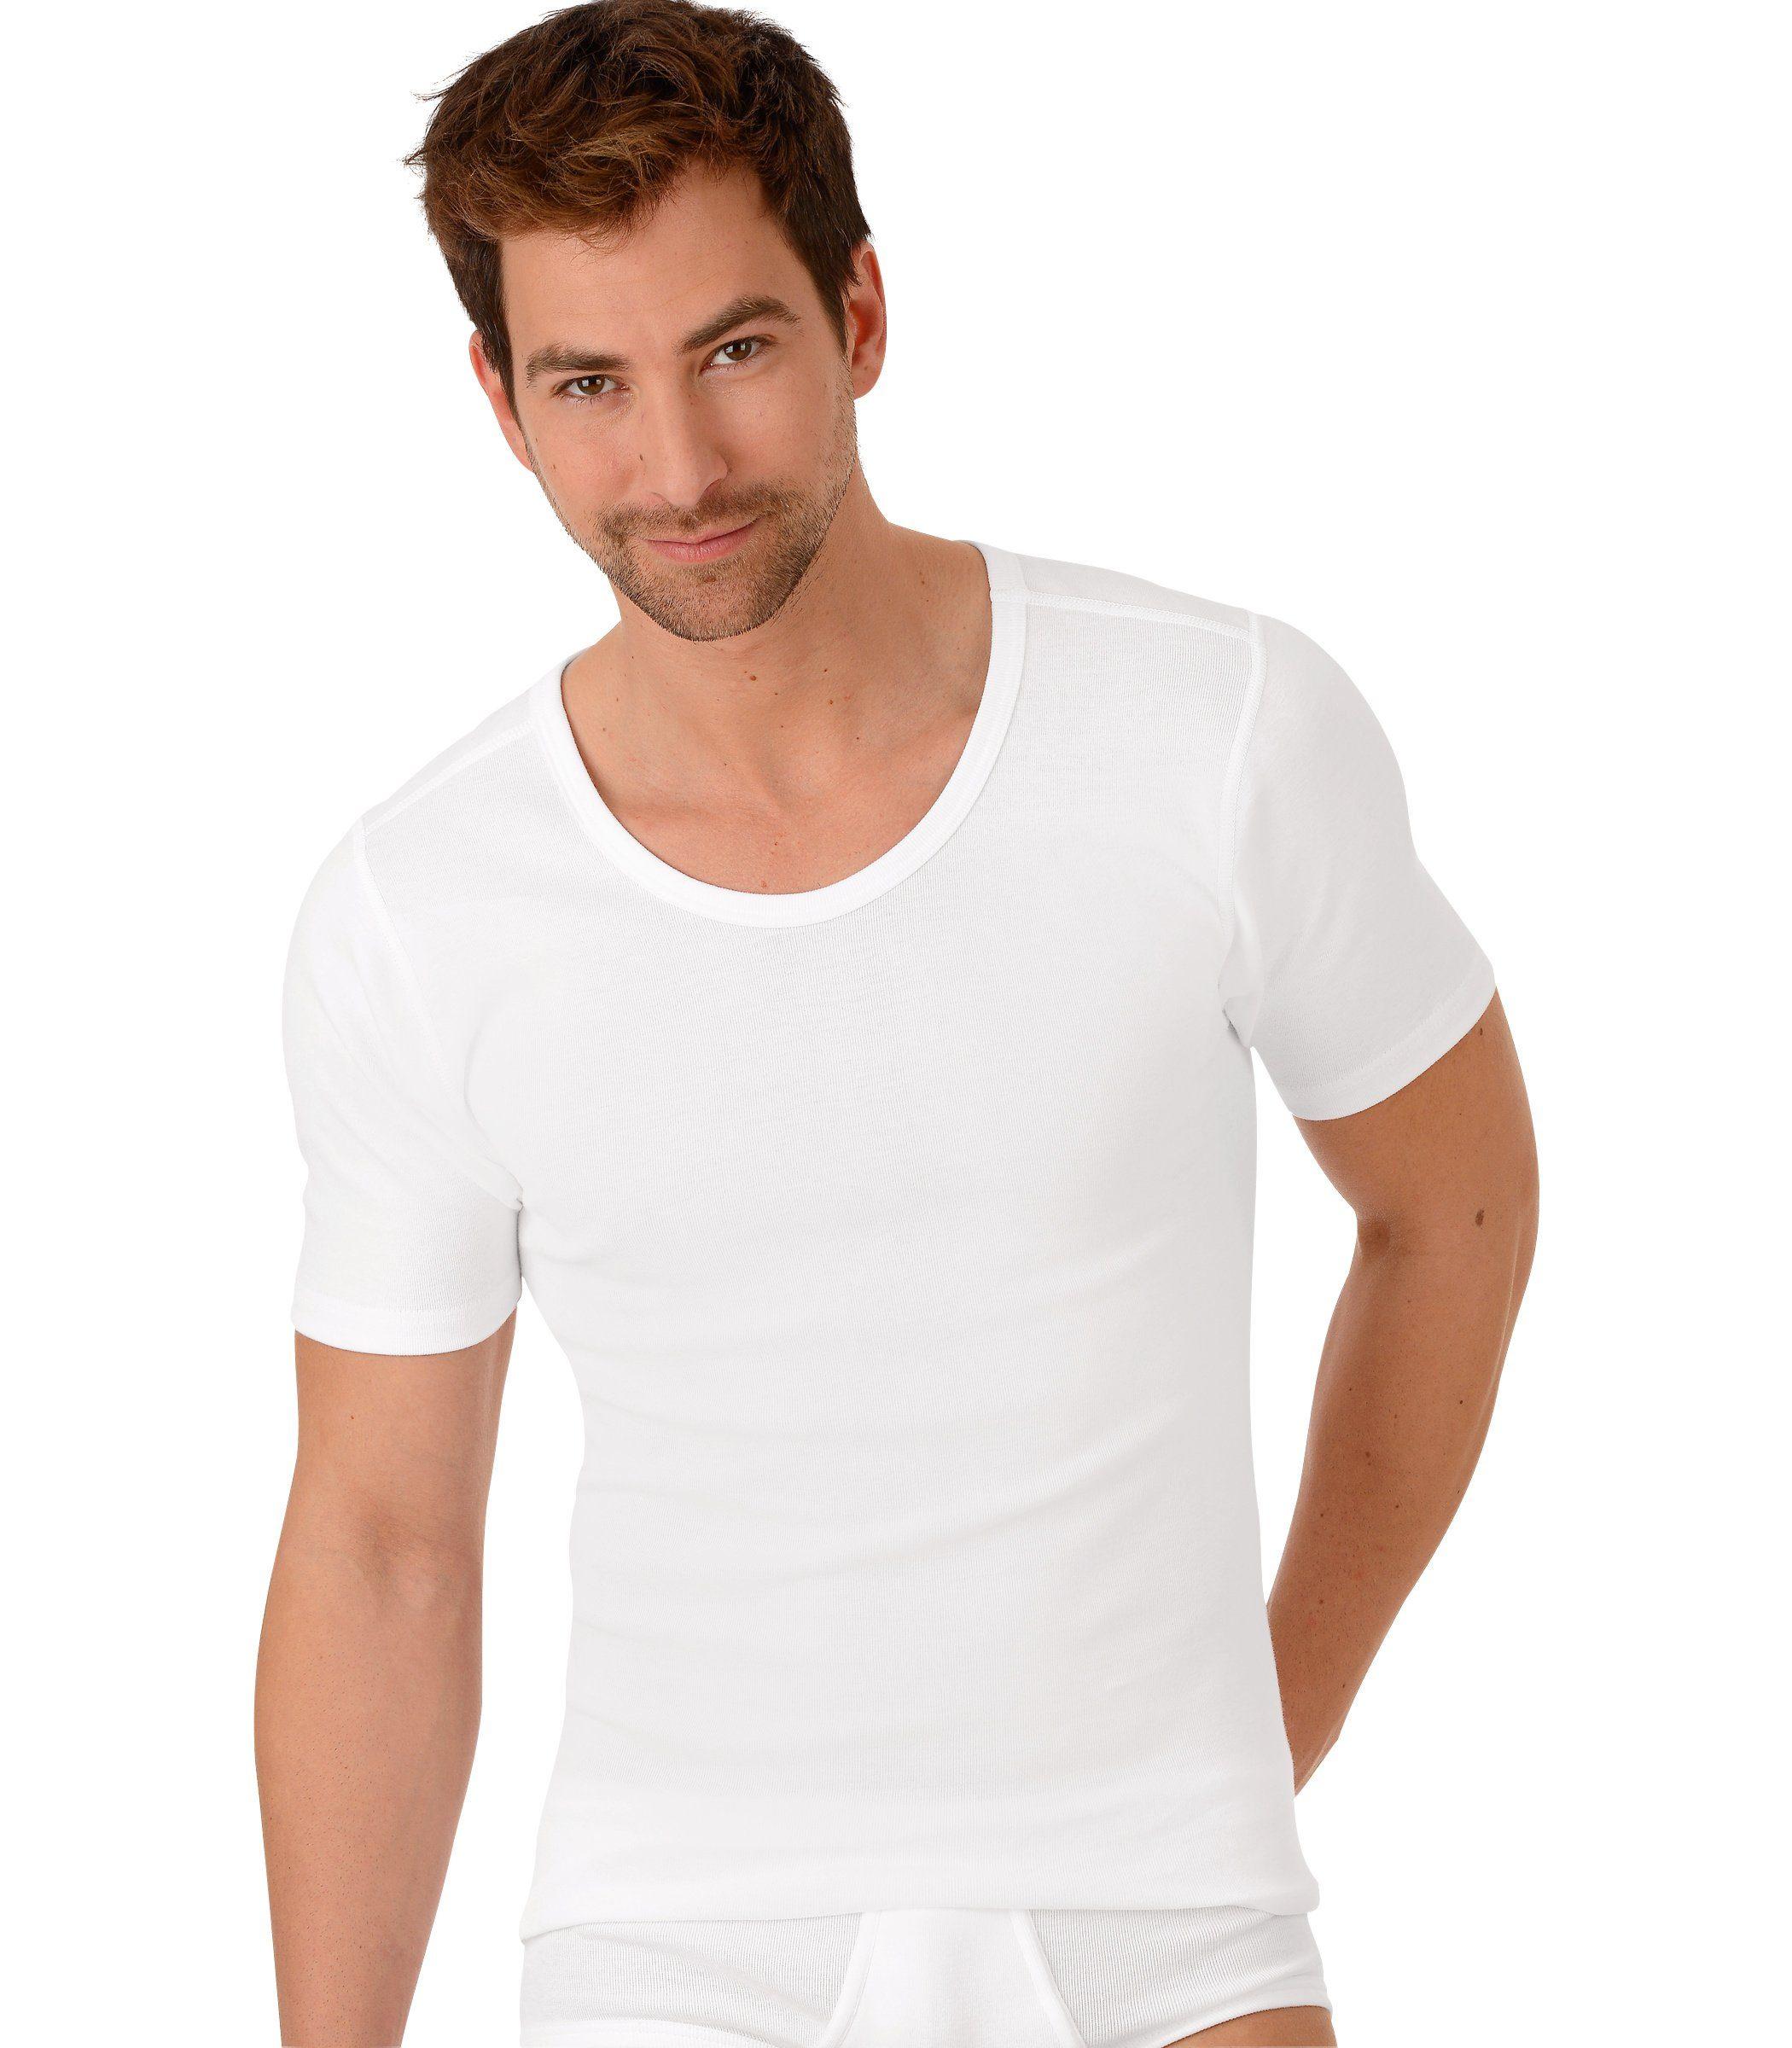 Prices For Sale Discount Factory Outlet Mens Trigema Herren Unterhemd 100% Bio Doppelpack Vest Trigema iKp49taryE